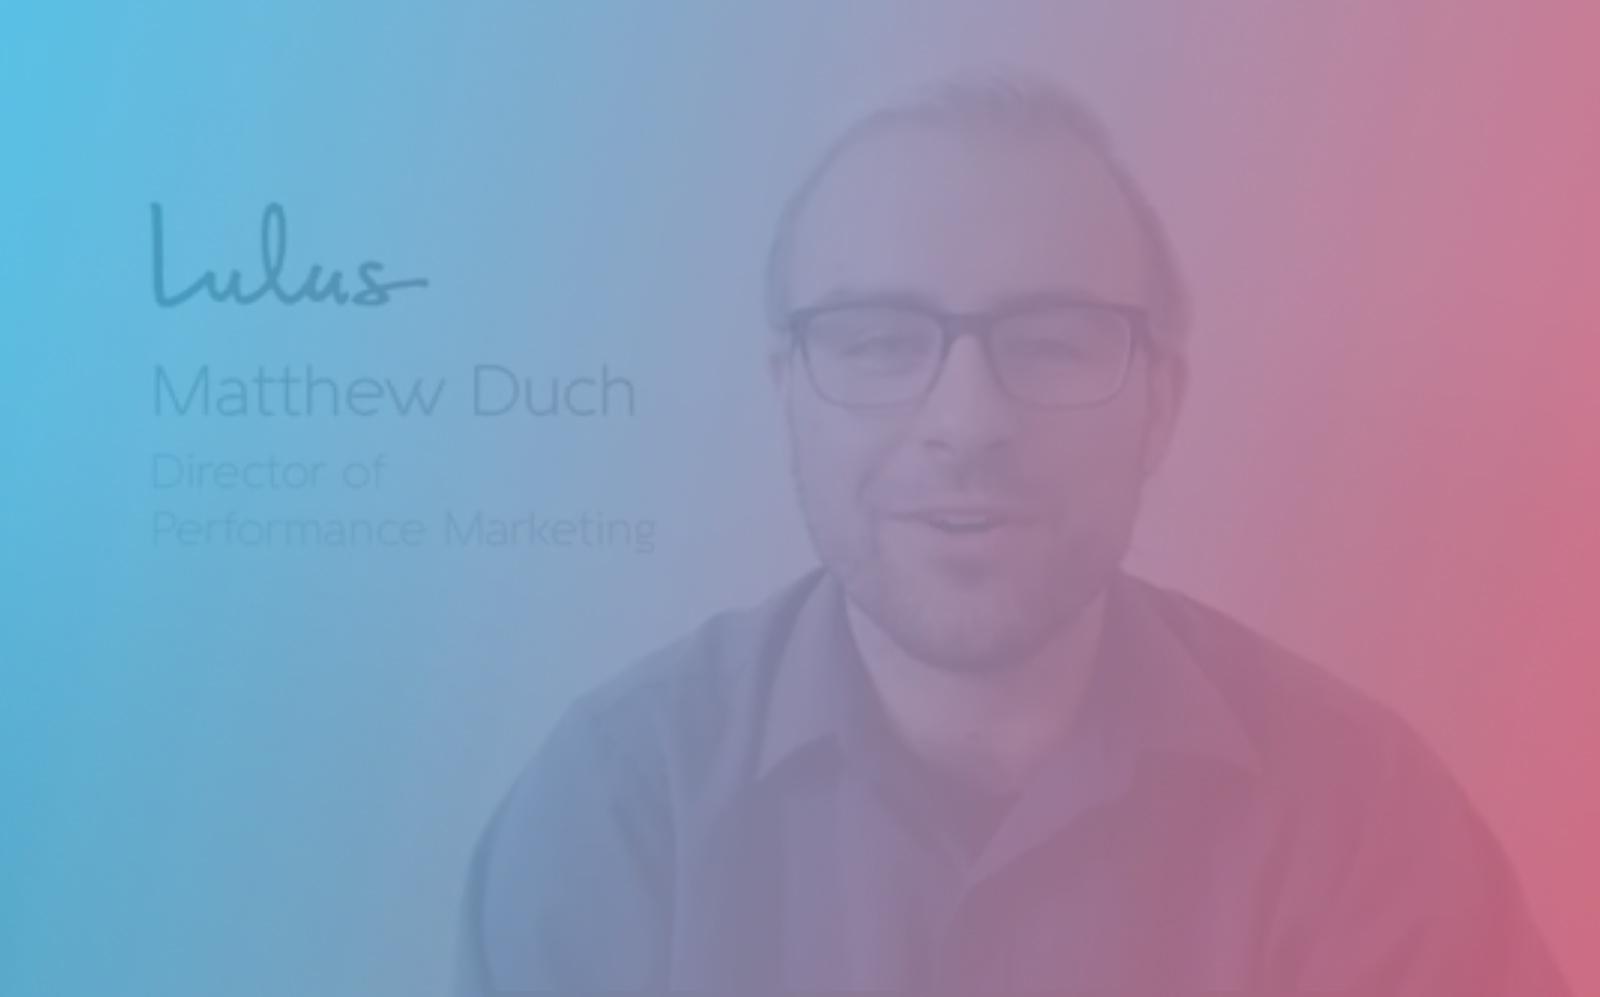 Matthew-Duch-Lulus-Director-performance-marketing